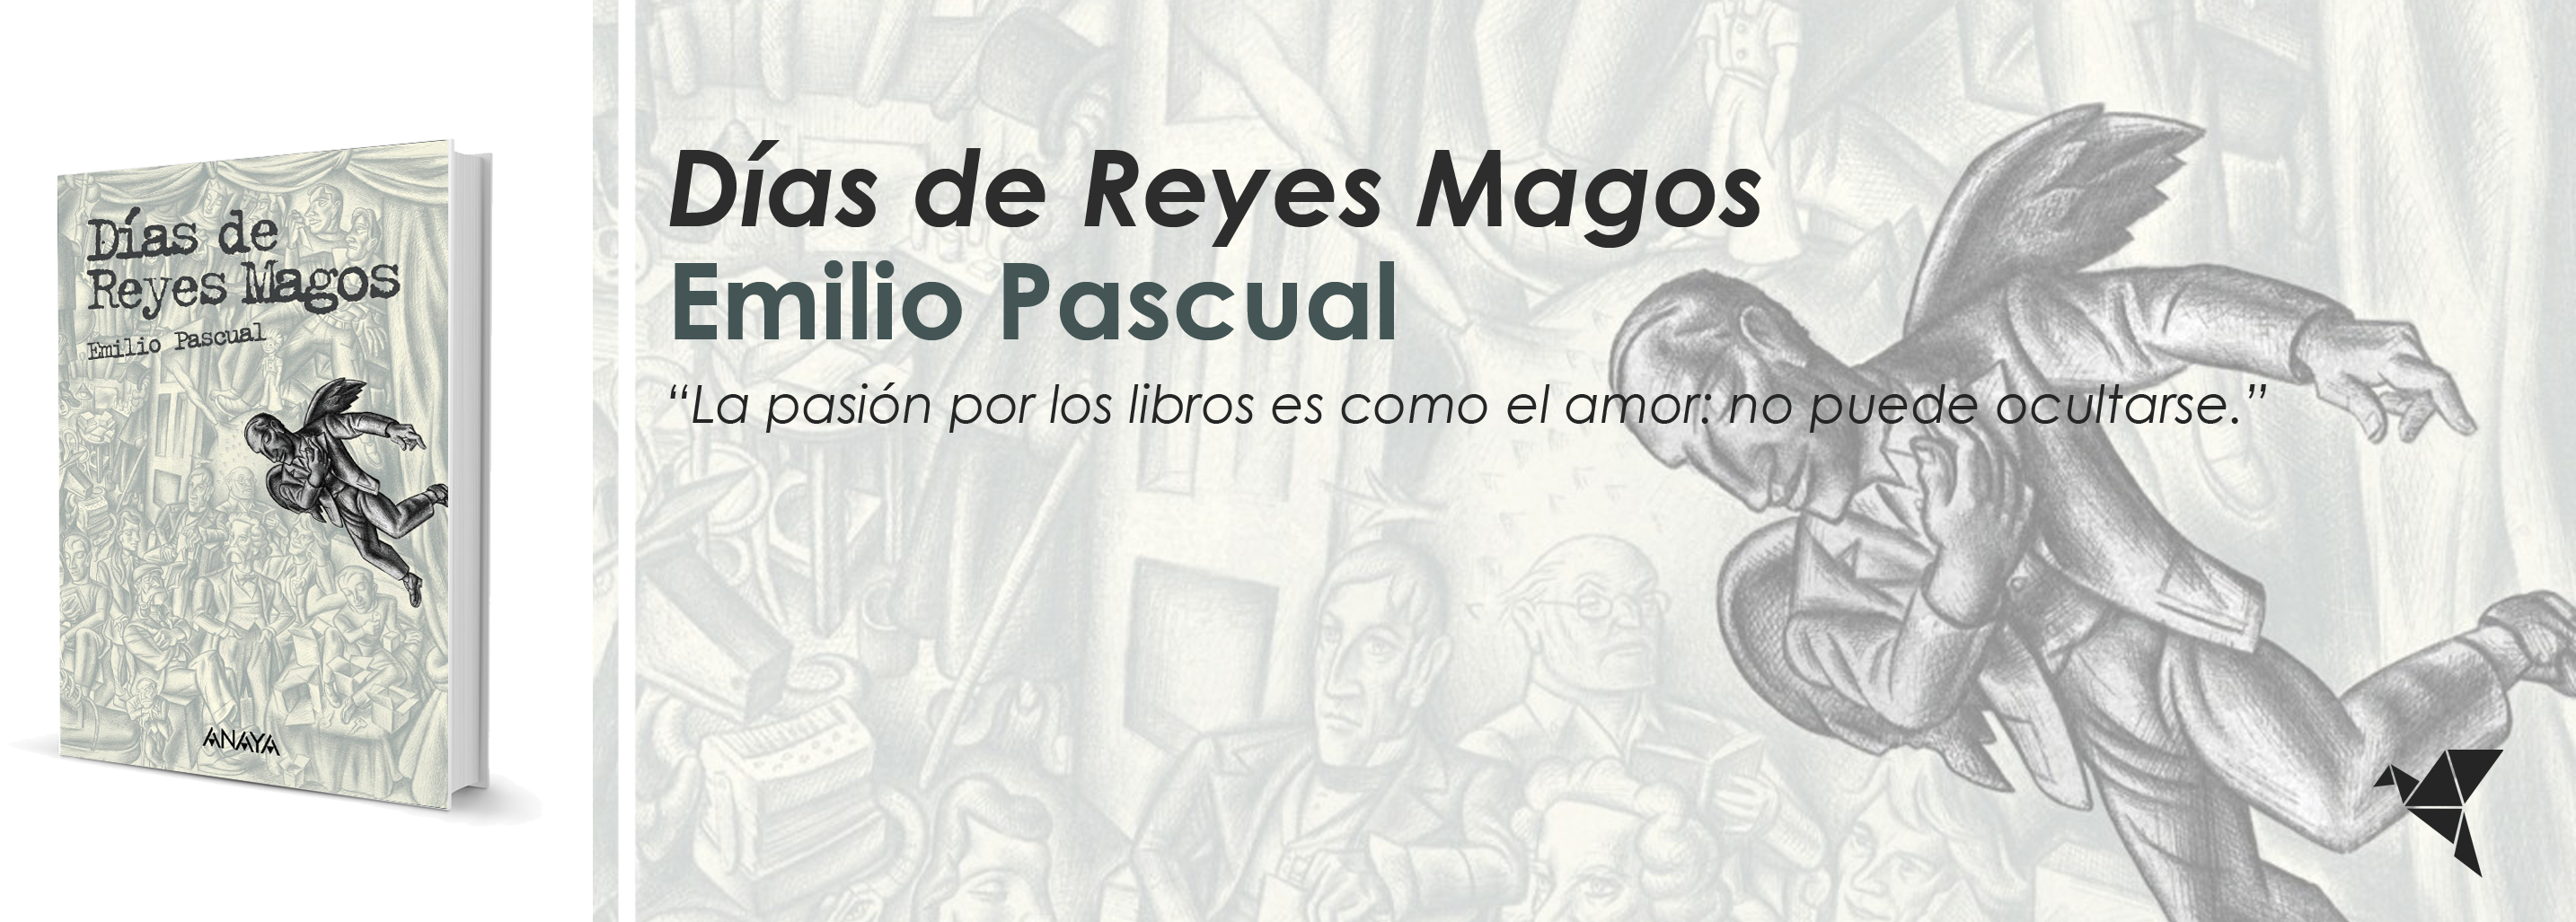 Días de Reyes Magos, de Emilio Pascual